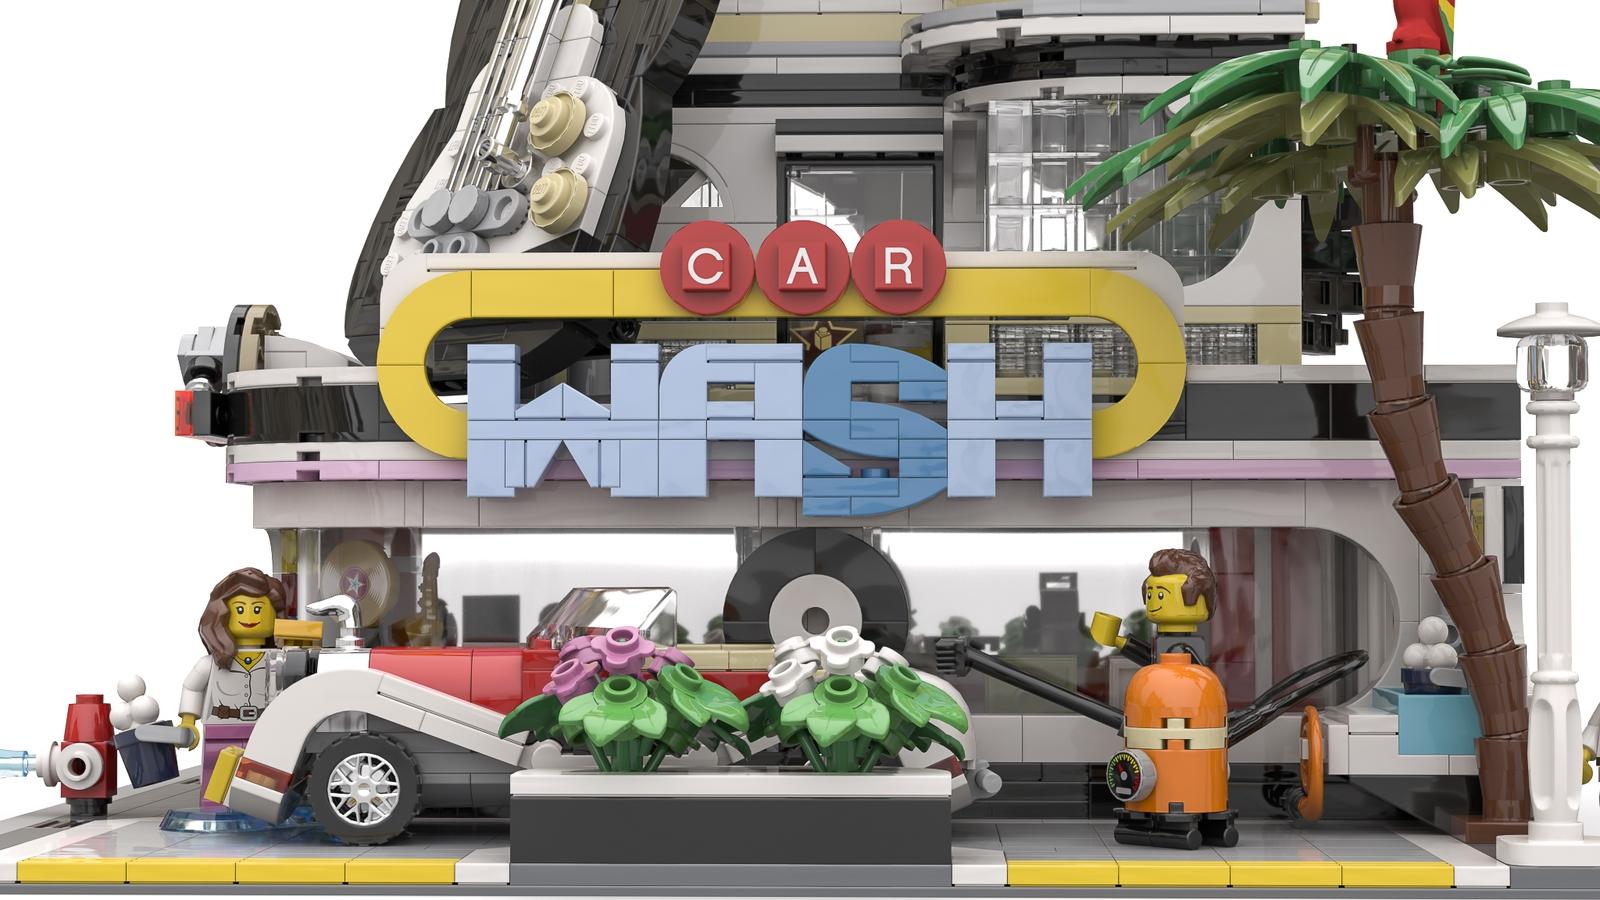 lego-ideas-the-car-wash-e-gitarre-logo-bricky-brick zusammengebaut.com